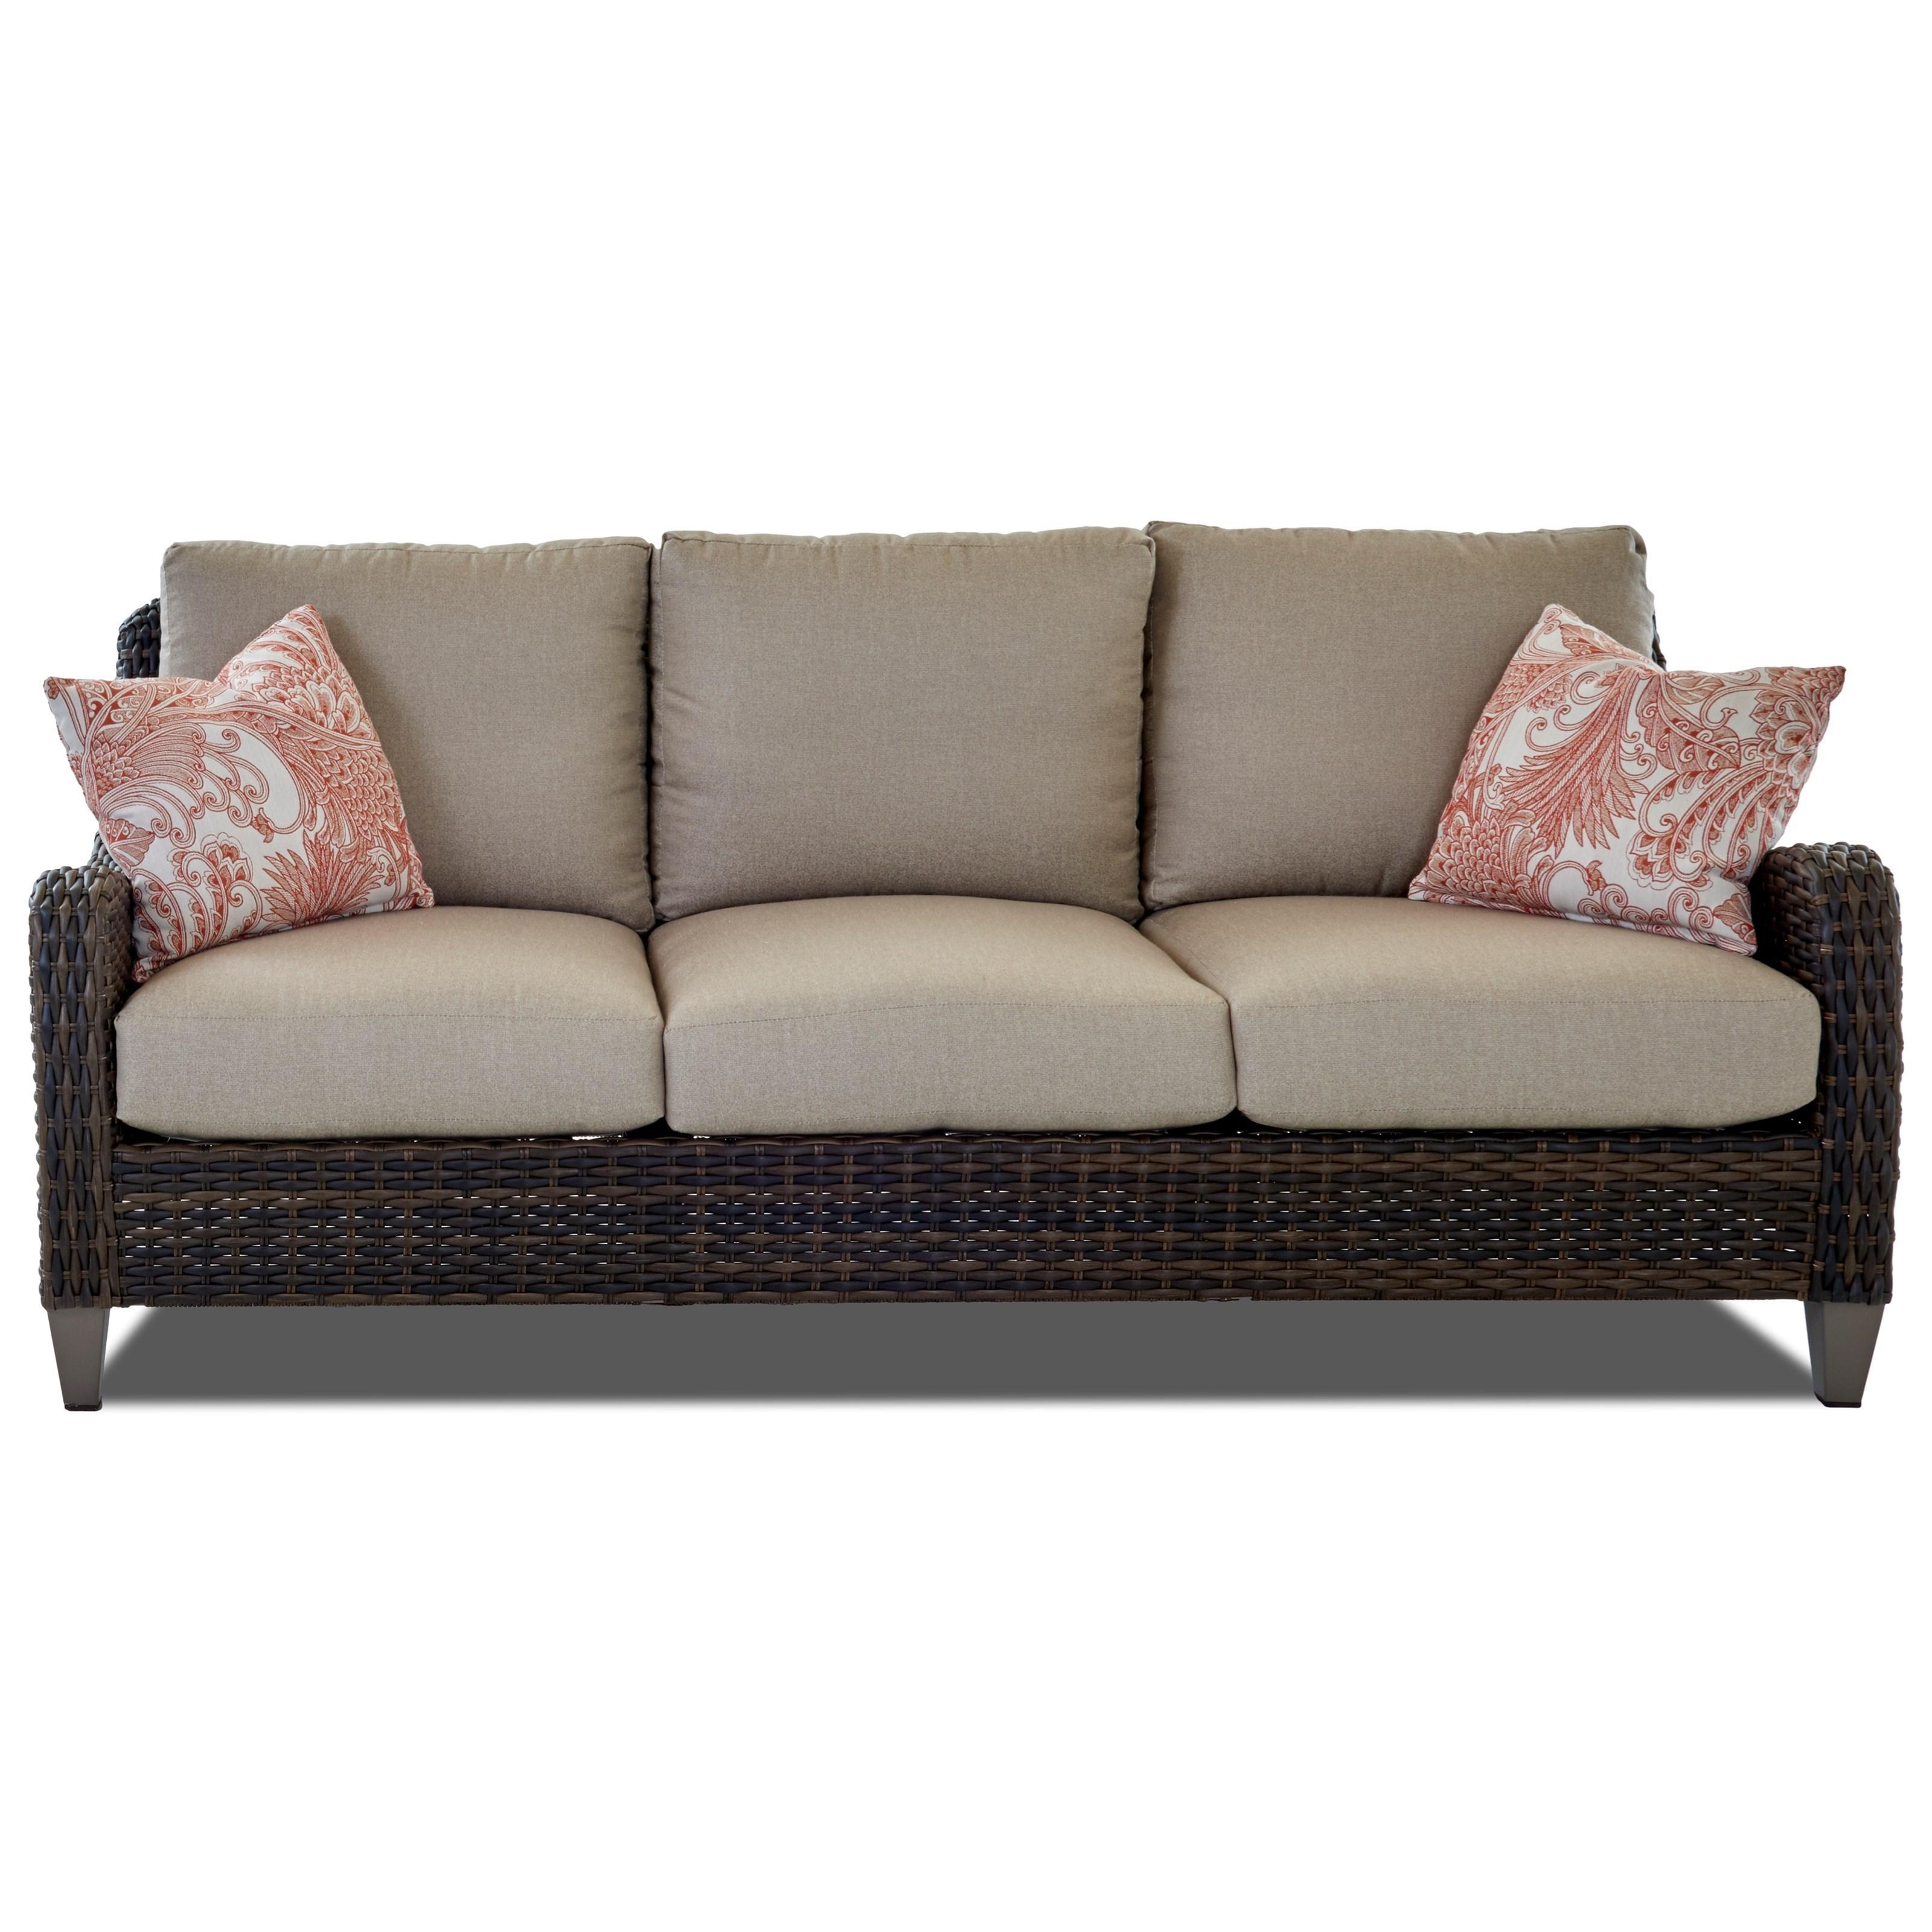 ... Klaussner Outdoor MesaSofa With Drainable Cushion ...